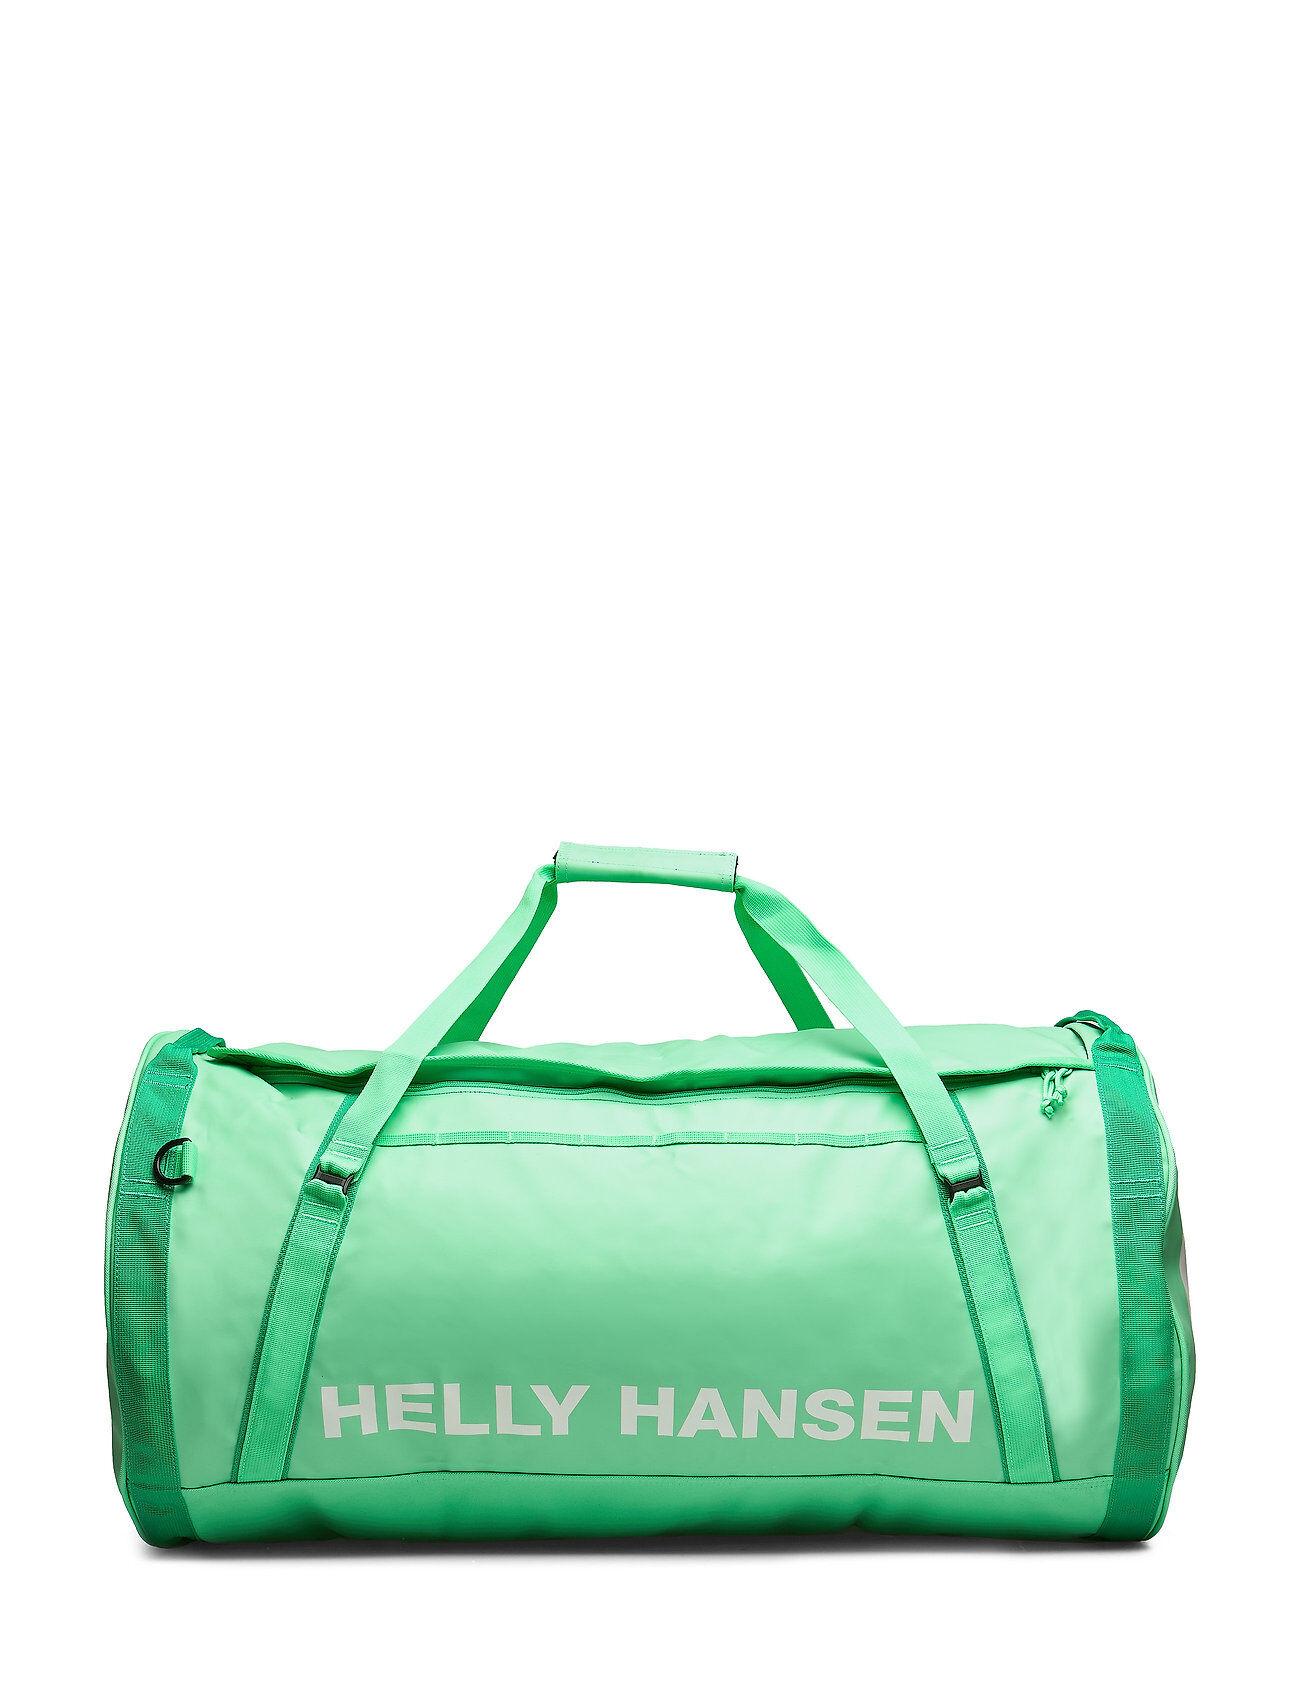 Image of Helly Hansen Hh Duffel Bag 2 90l Bags Weekend & Gym Bags Vihreä Helly Hansen